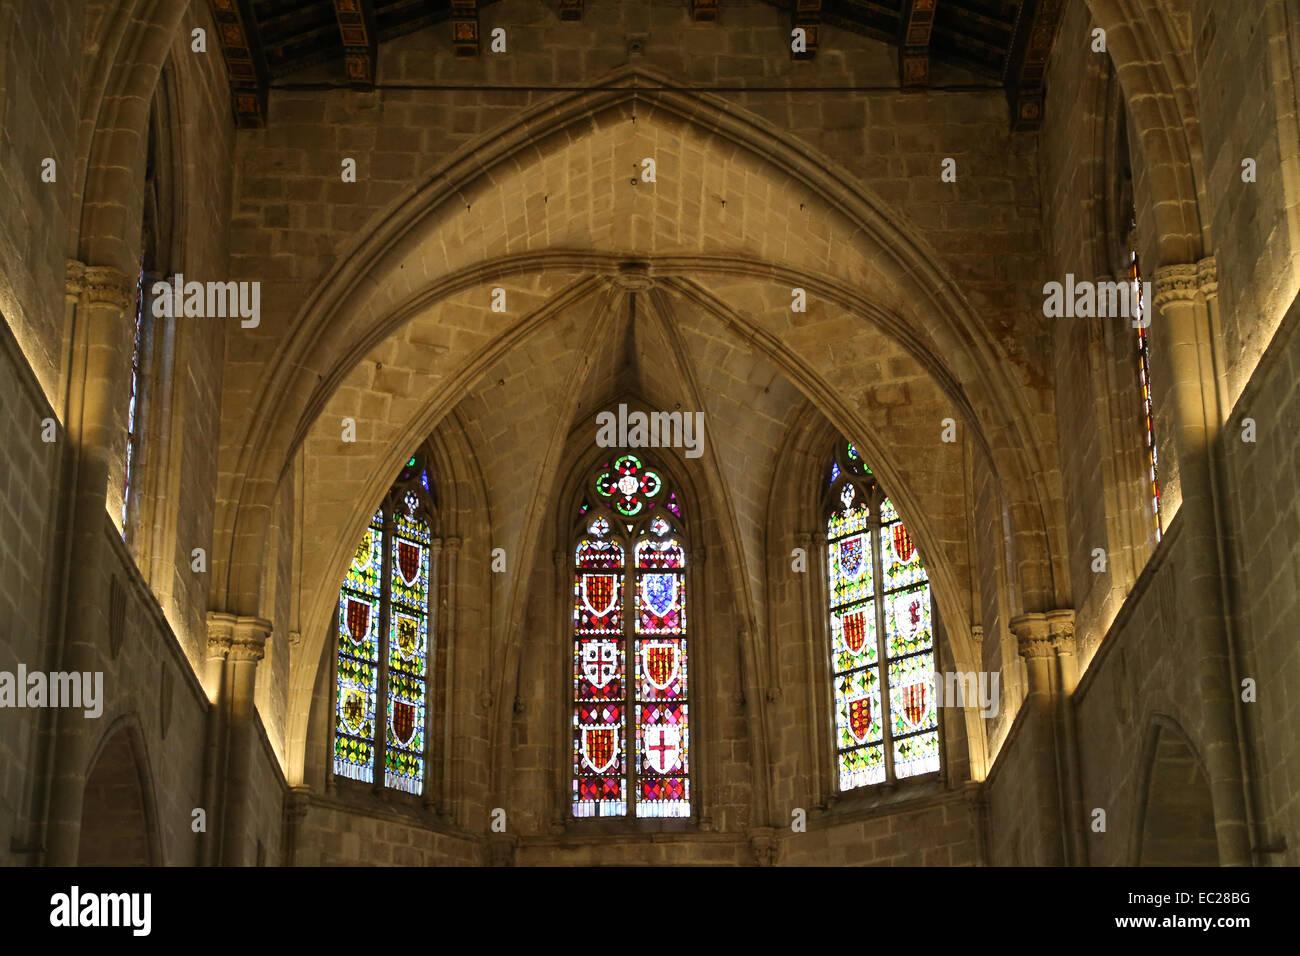 Spain. Barcelona. The Palatine Chapel of St. Agatha (1302). Built under King James II. Polygonal apse. - Stock Image